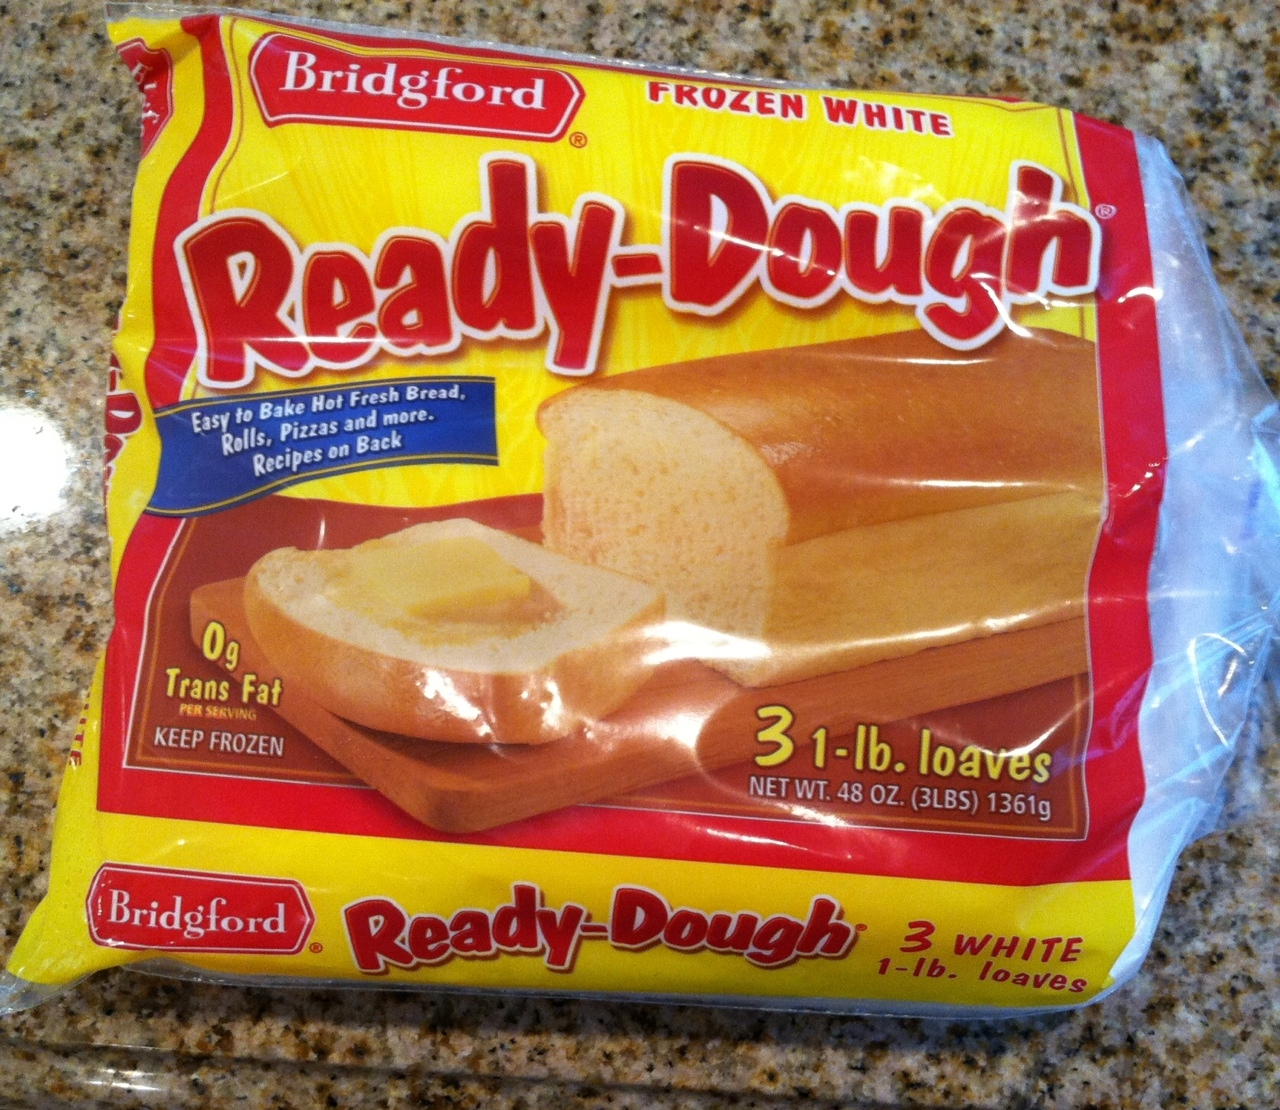 Bridgford frozen bread dough coupons